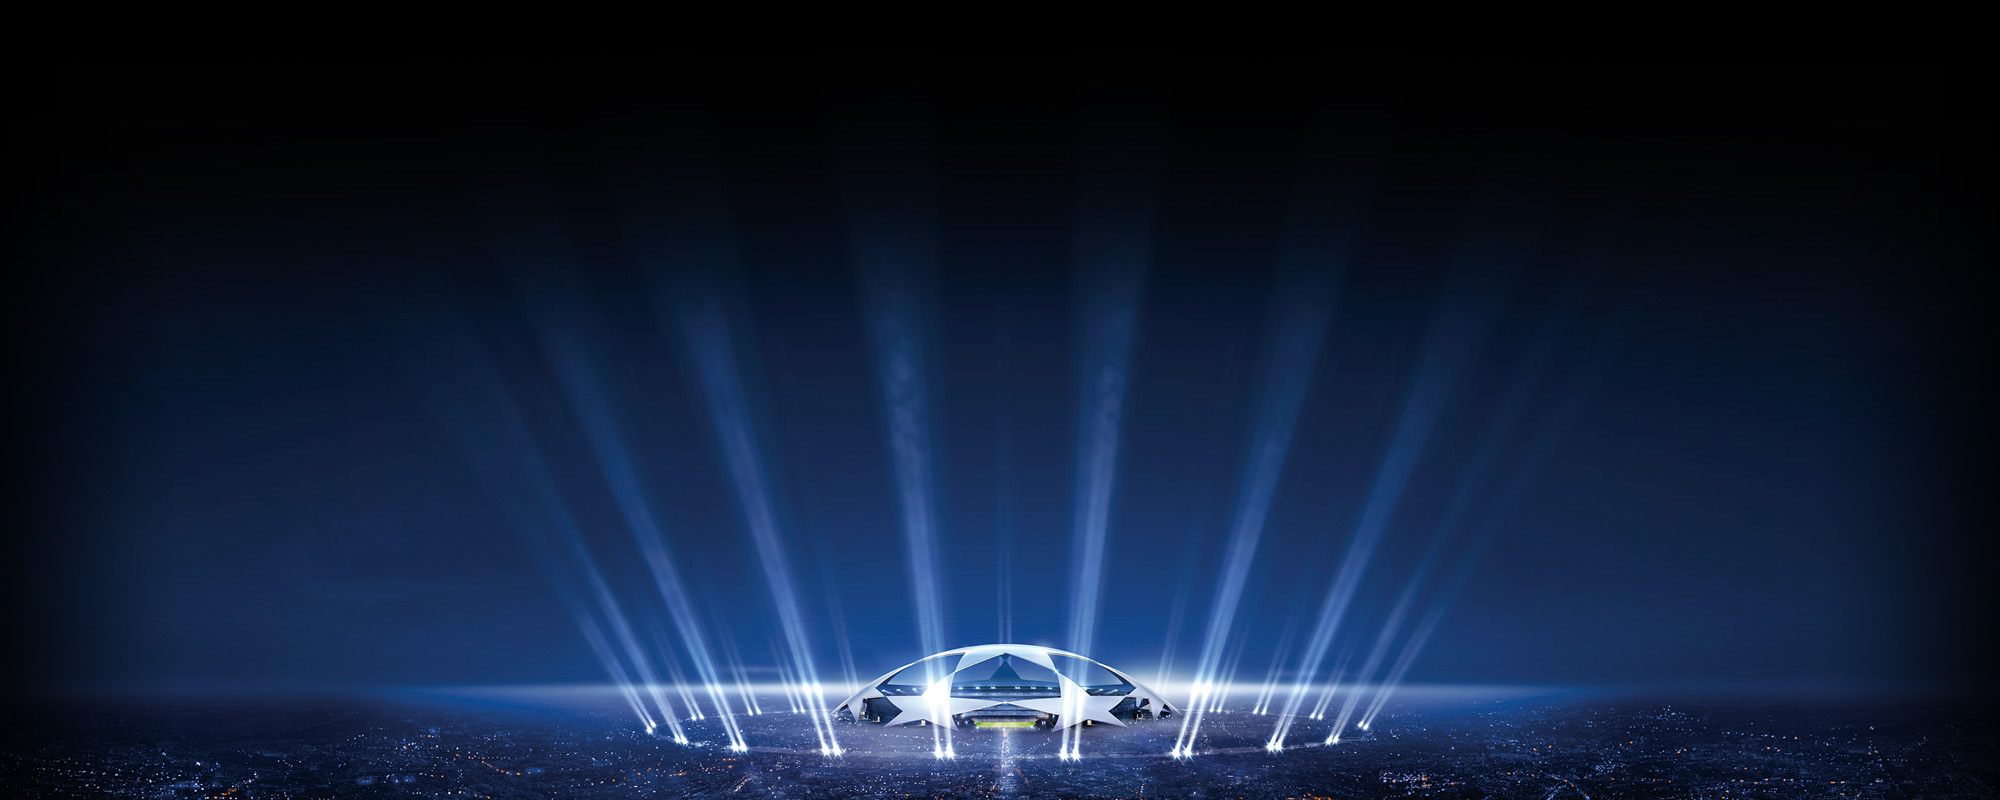 Durham Fa Champions League Cup 2018 2019 Durham Fa